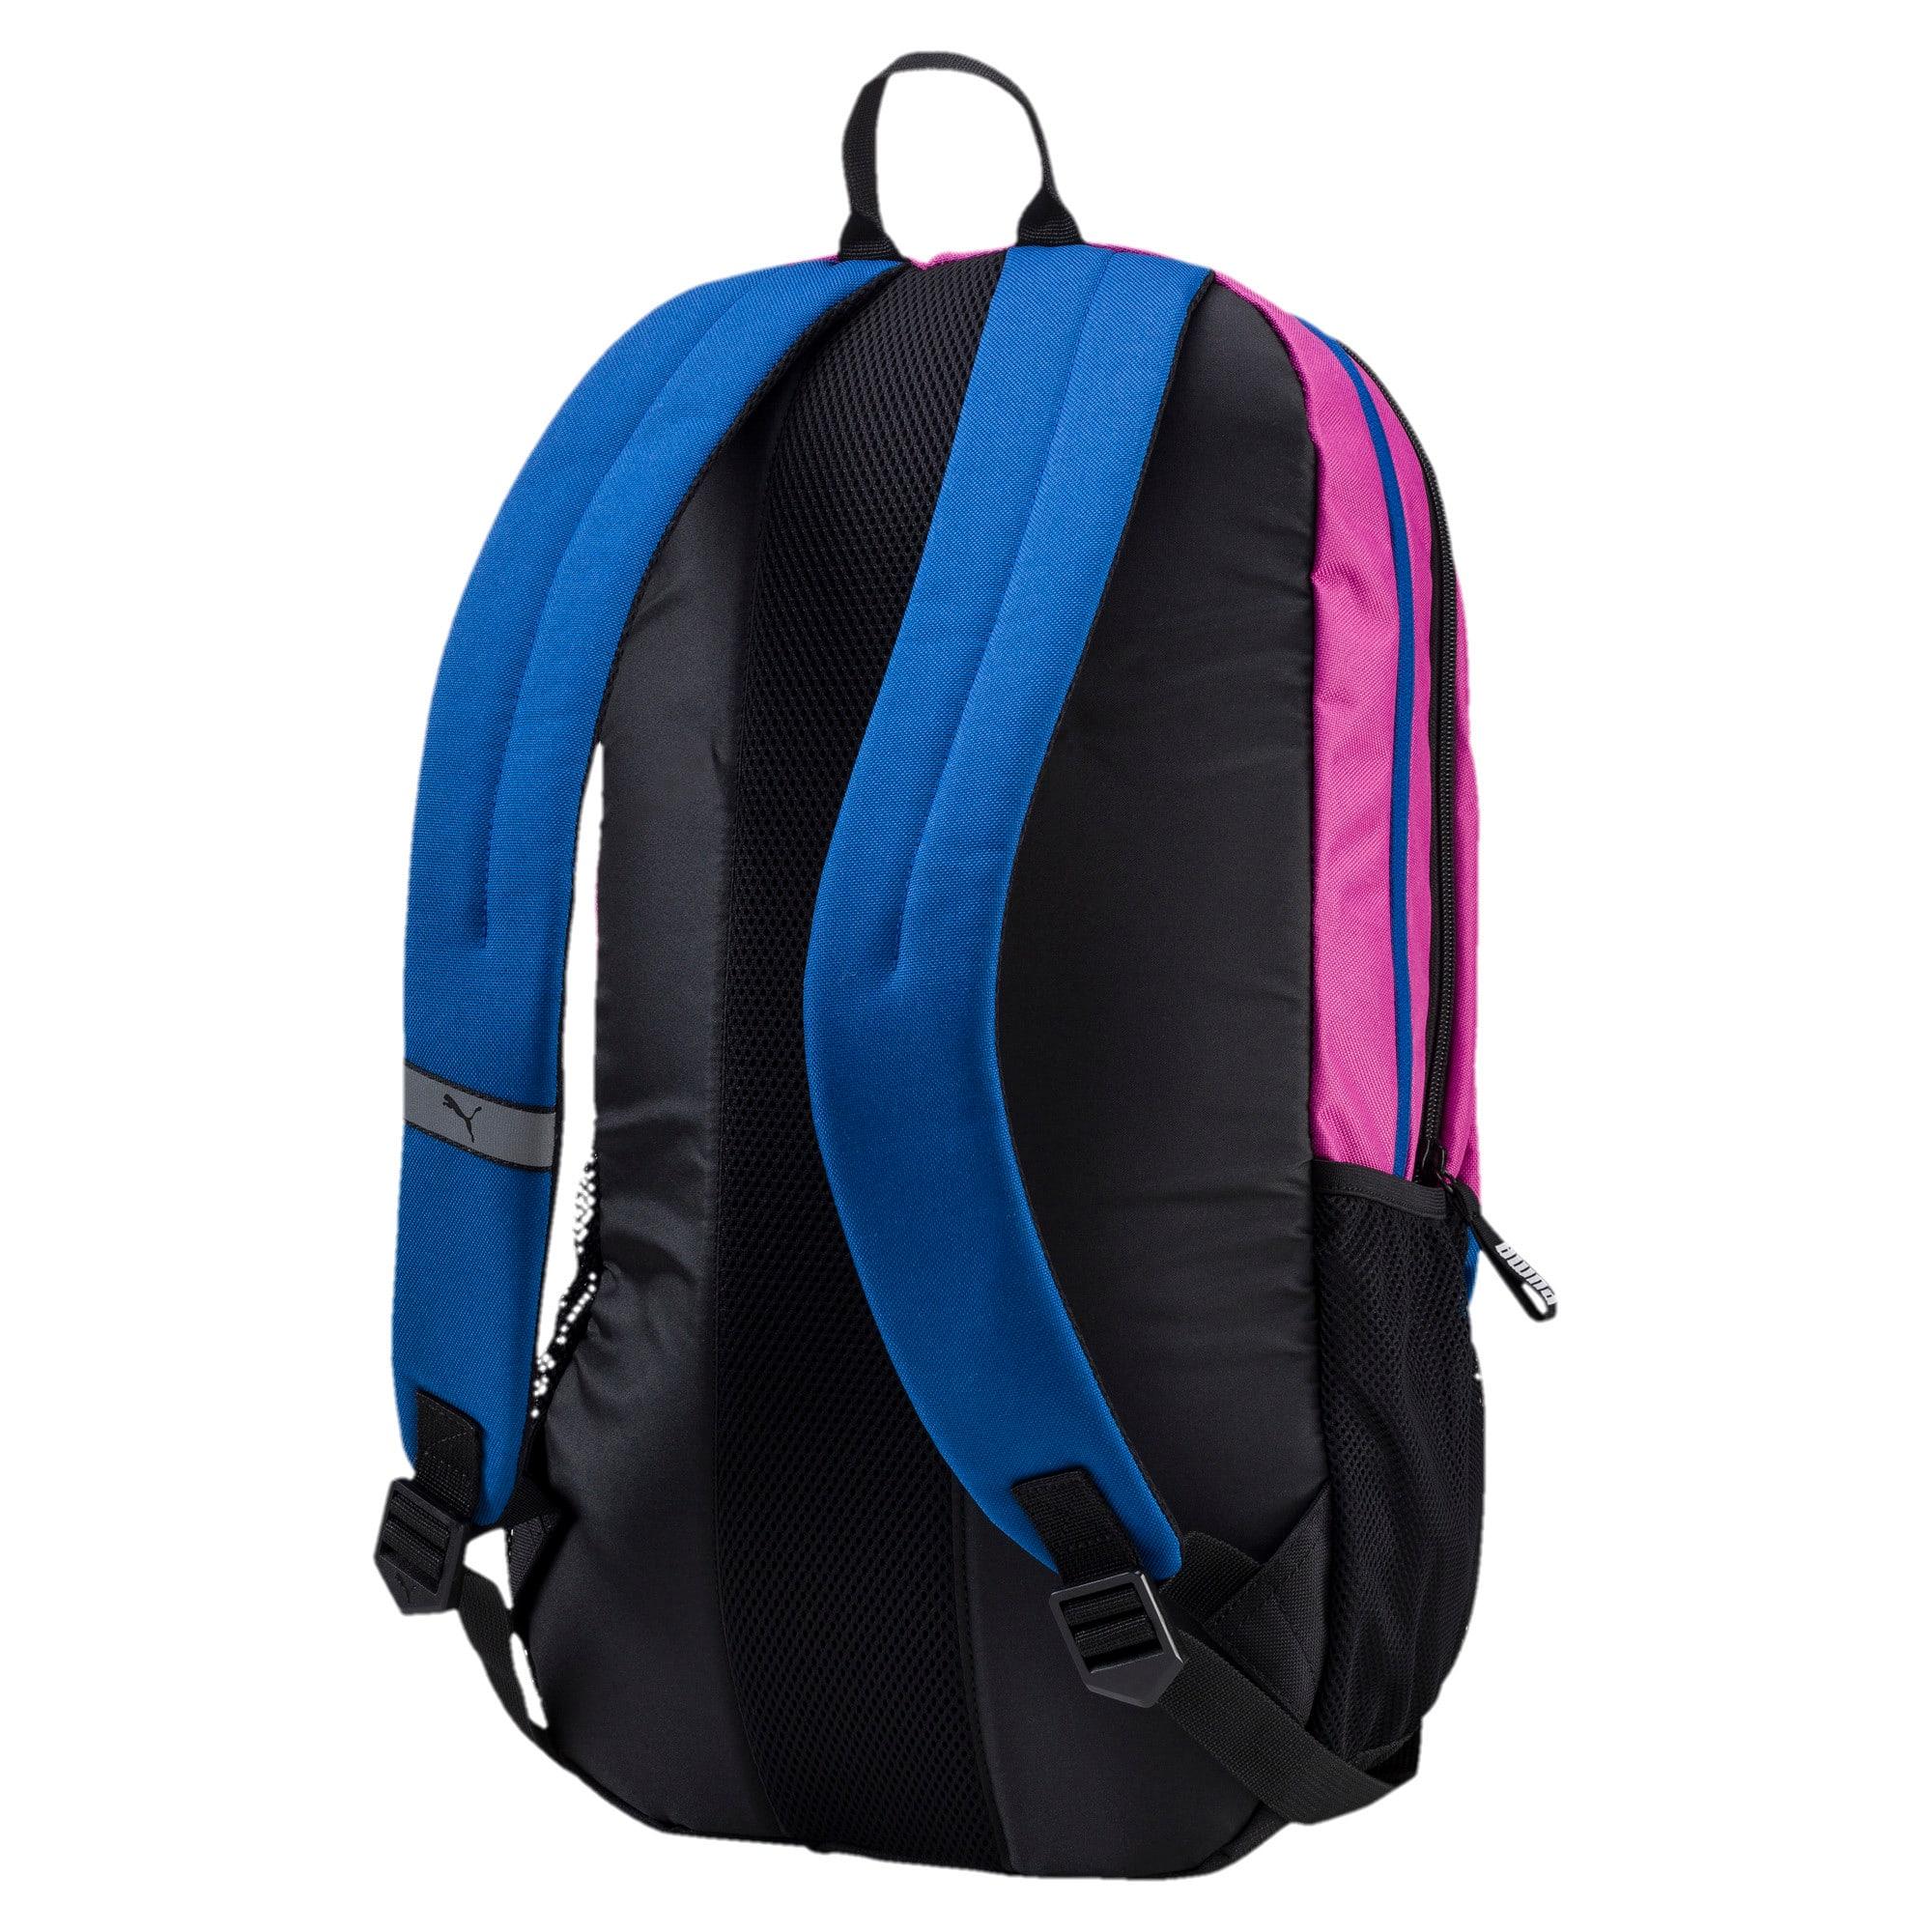 Thumbnail 2 of PUMA Deck Backpack, Rose Violet-TRUE BLUE, medium-IND